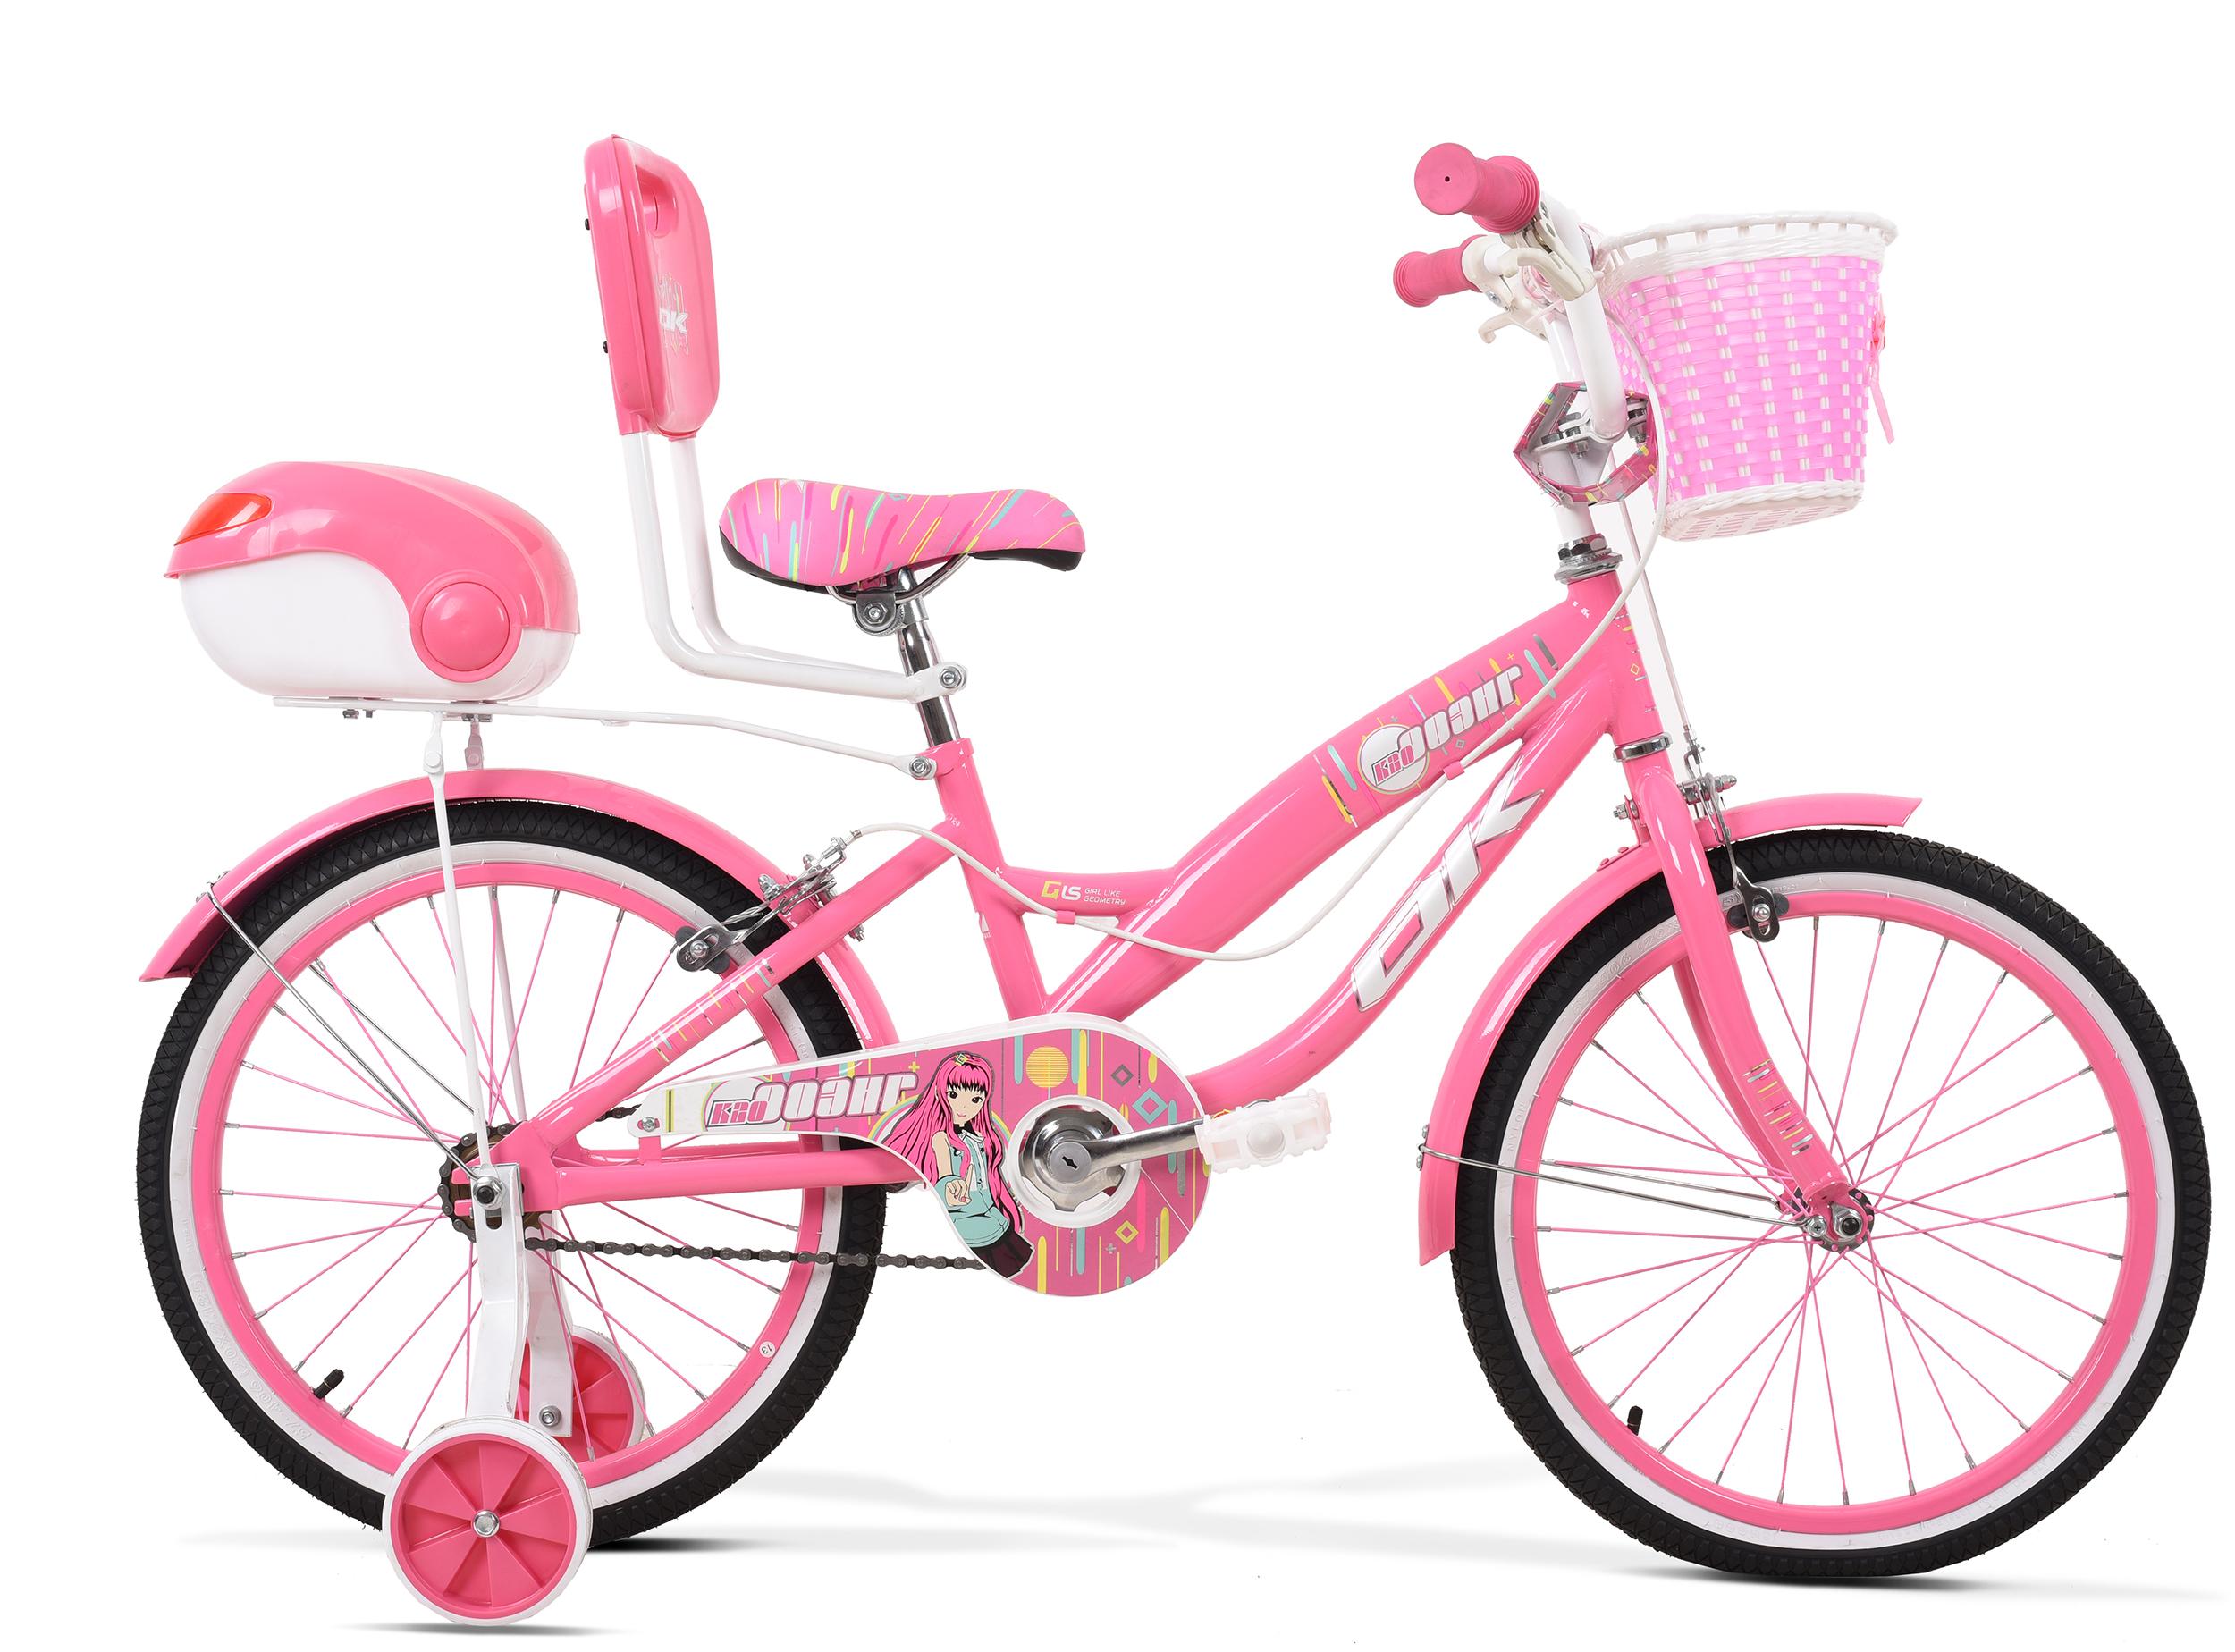 دوچرخه سایز 20 مدل K20003HR